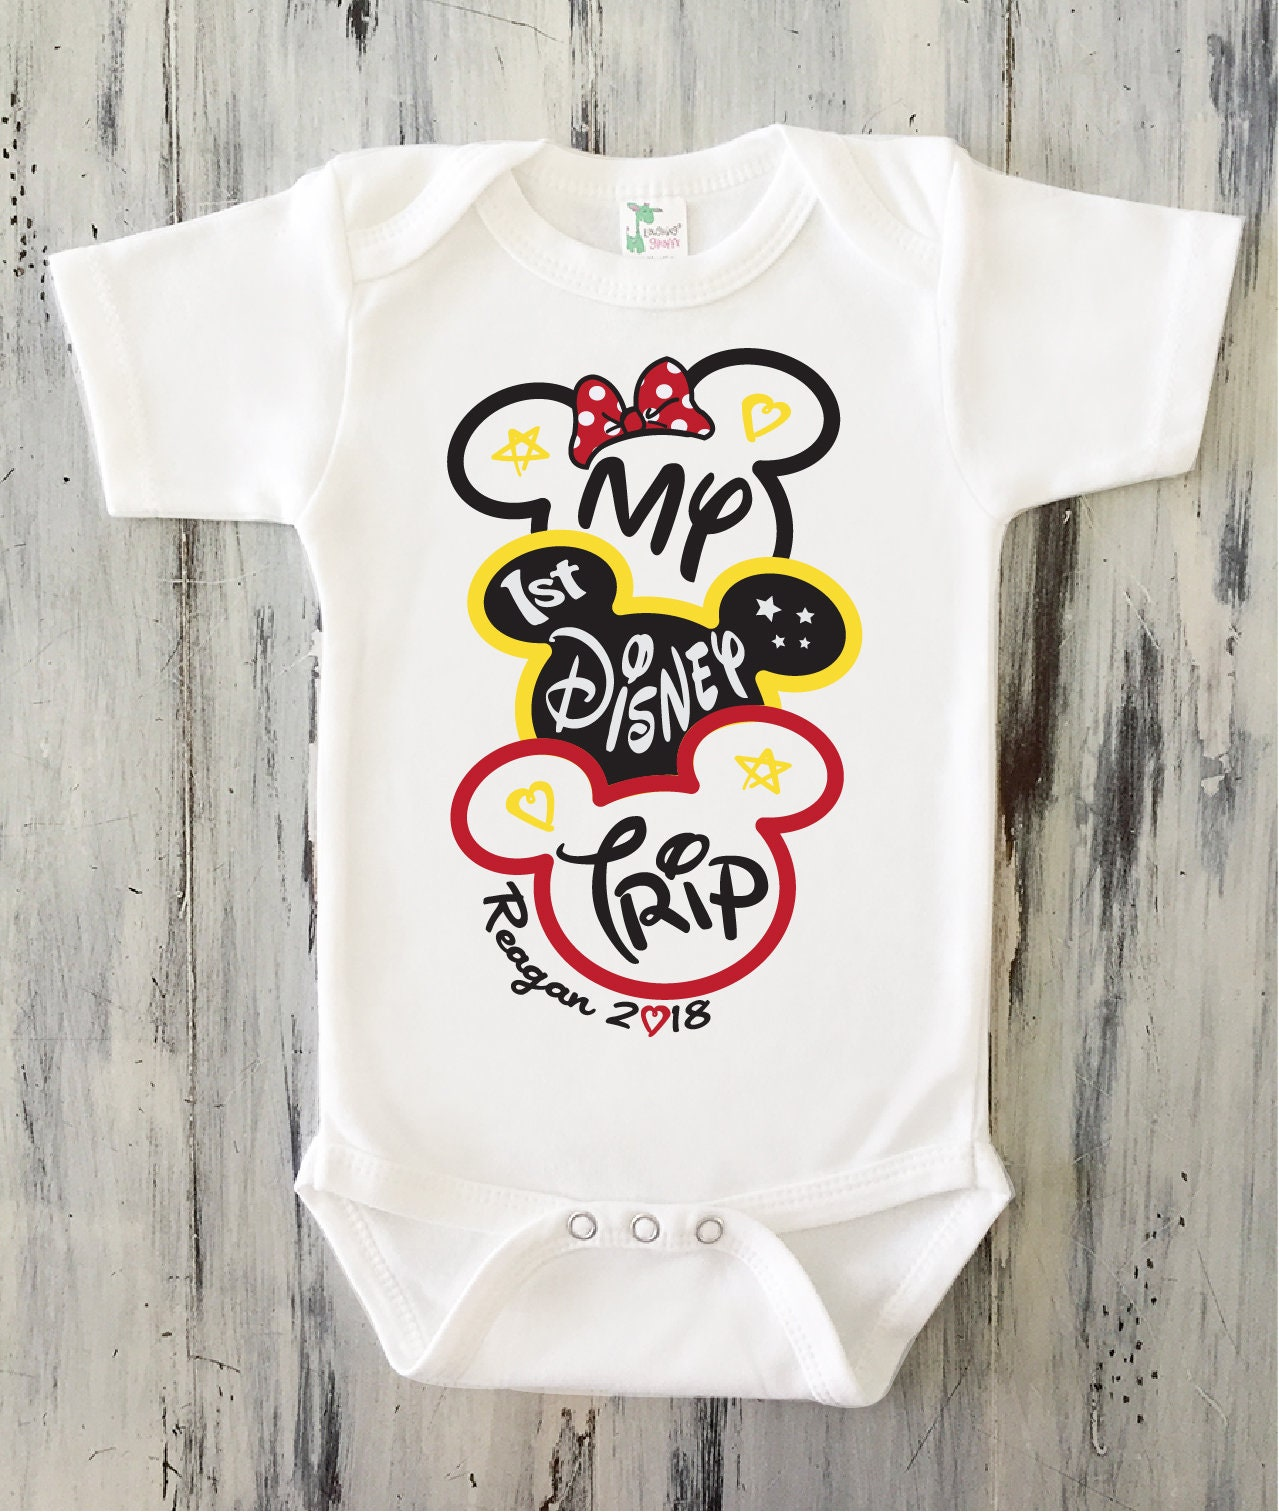 Girl Baby/'s First Disney Trip Bodysuit or T-Shirt